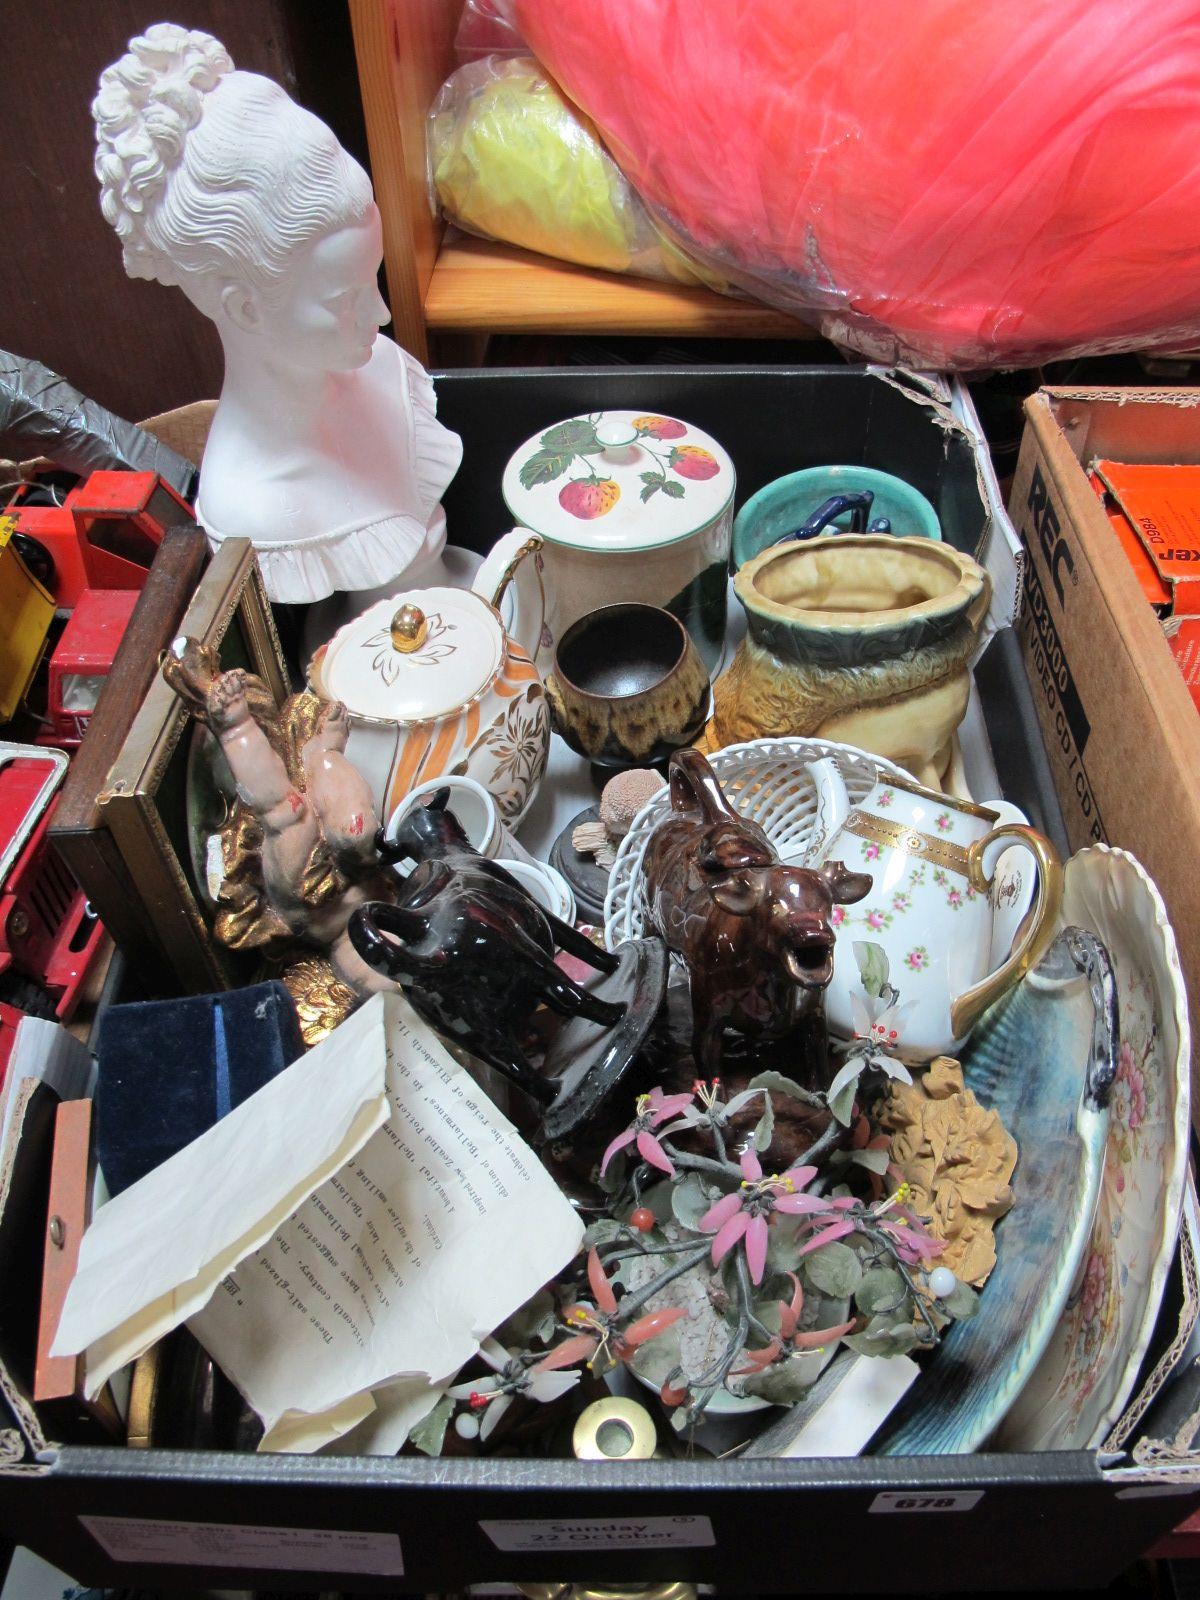 Lot 678 - Cow Creamers, plaster bust, coasters, Bonsai tree, Plichta berry jar, character jug, etc:- One Box